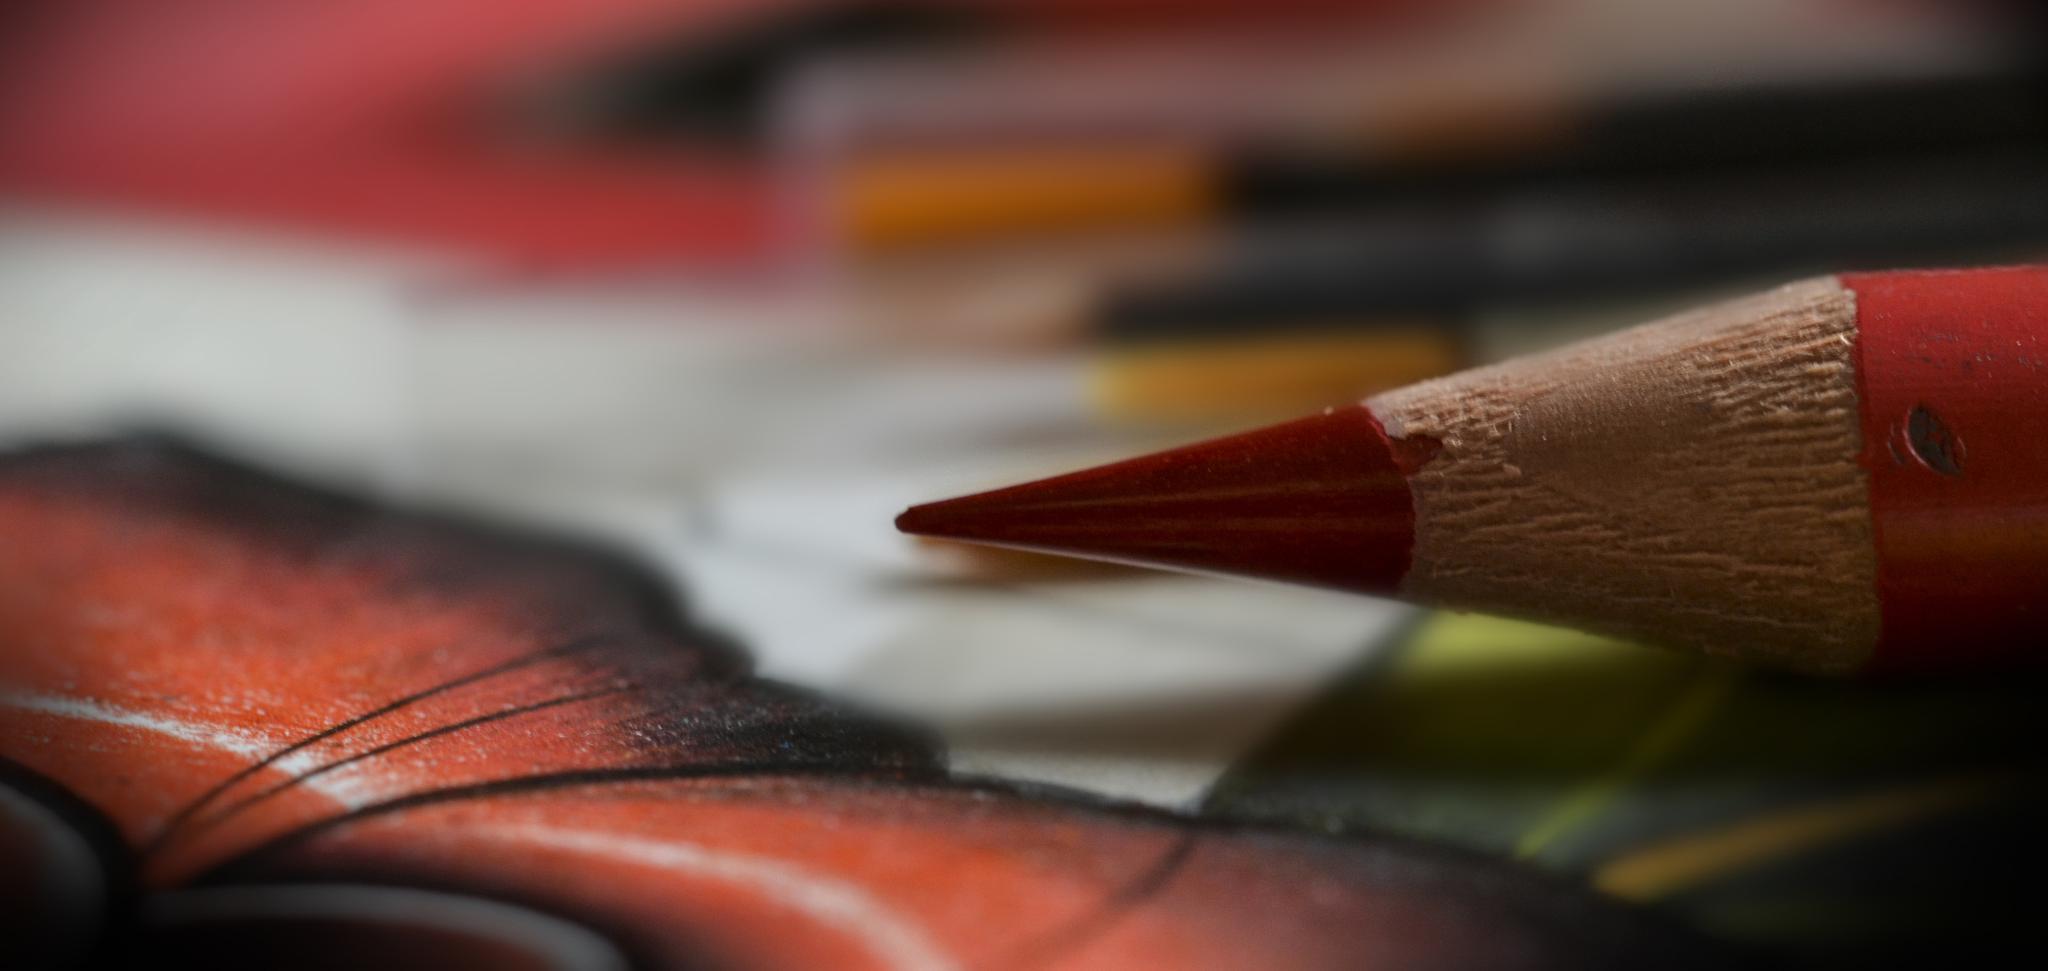 colored pencil by linda.boisvert.359